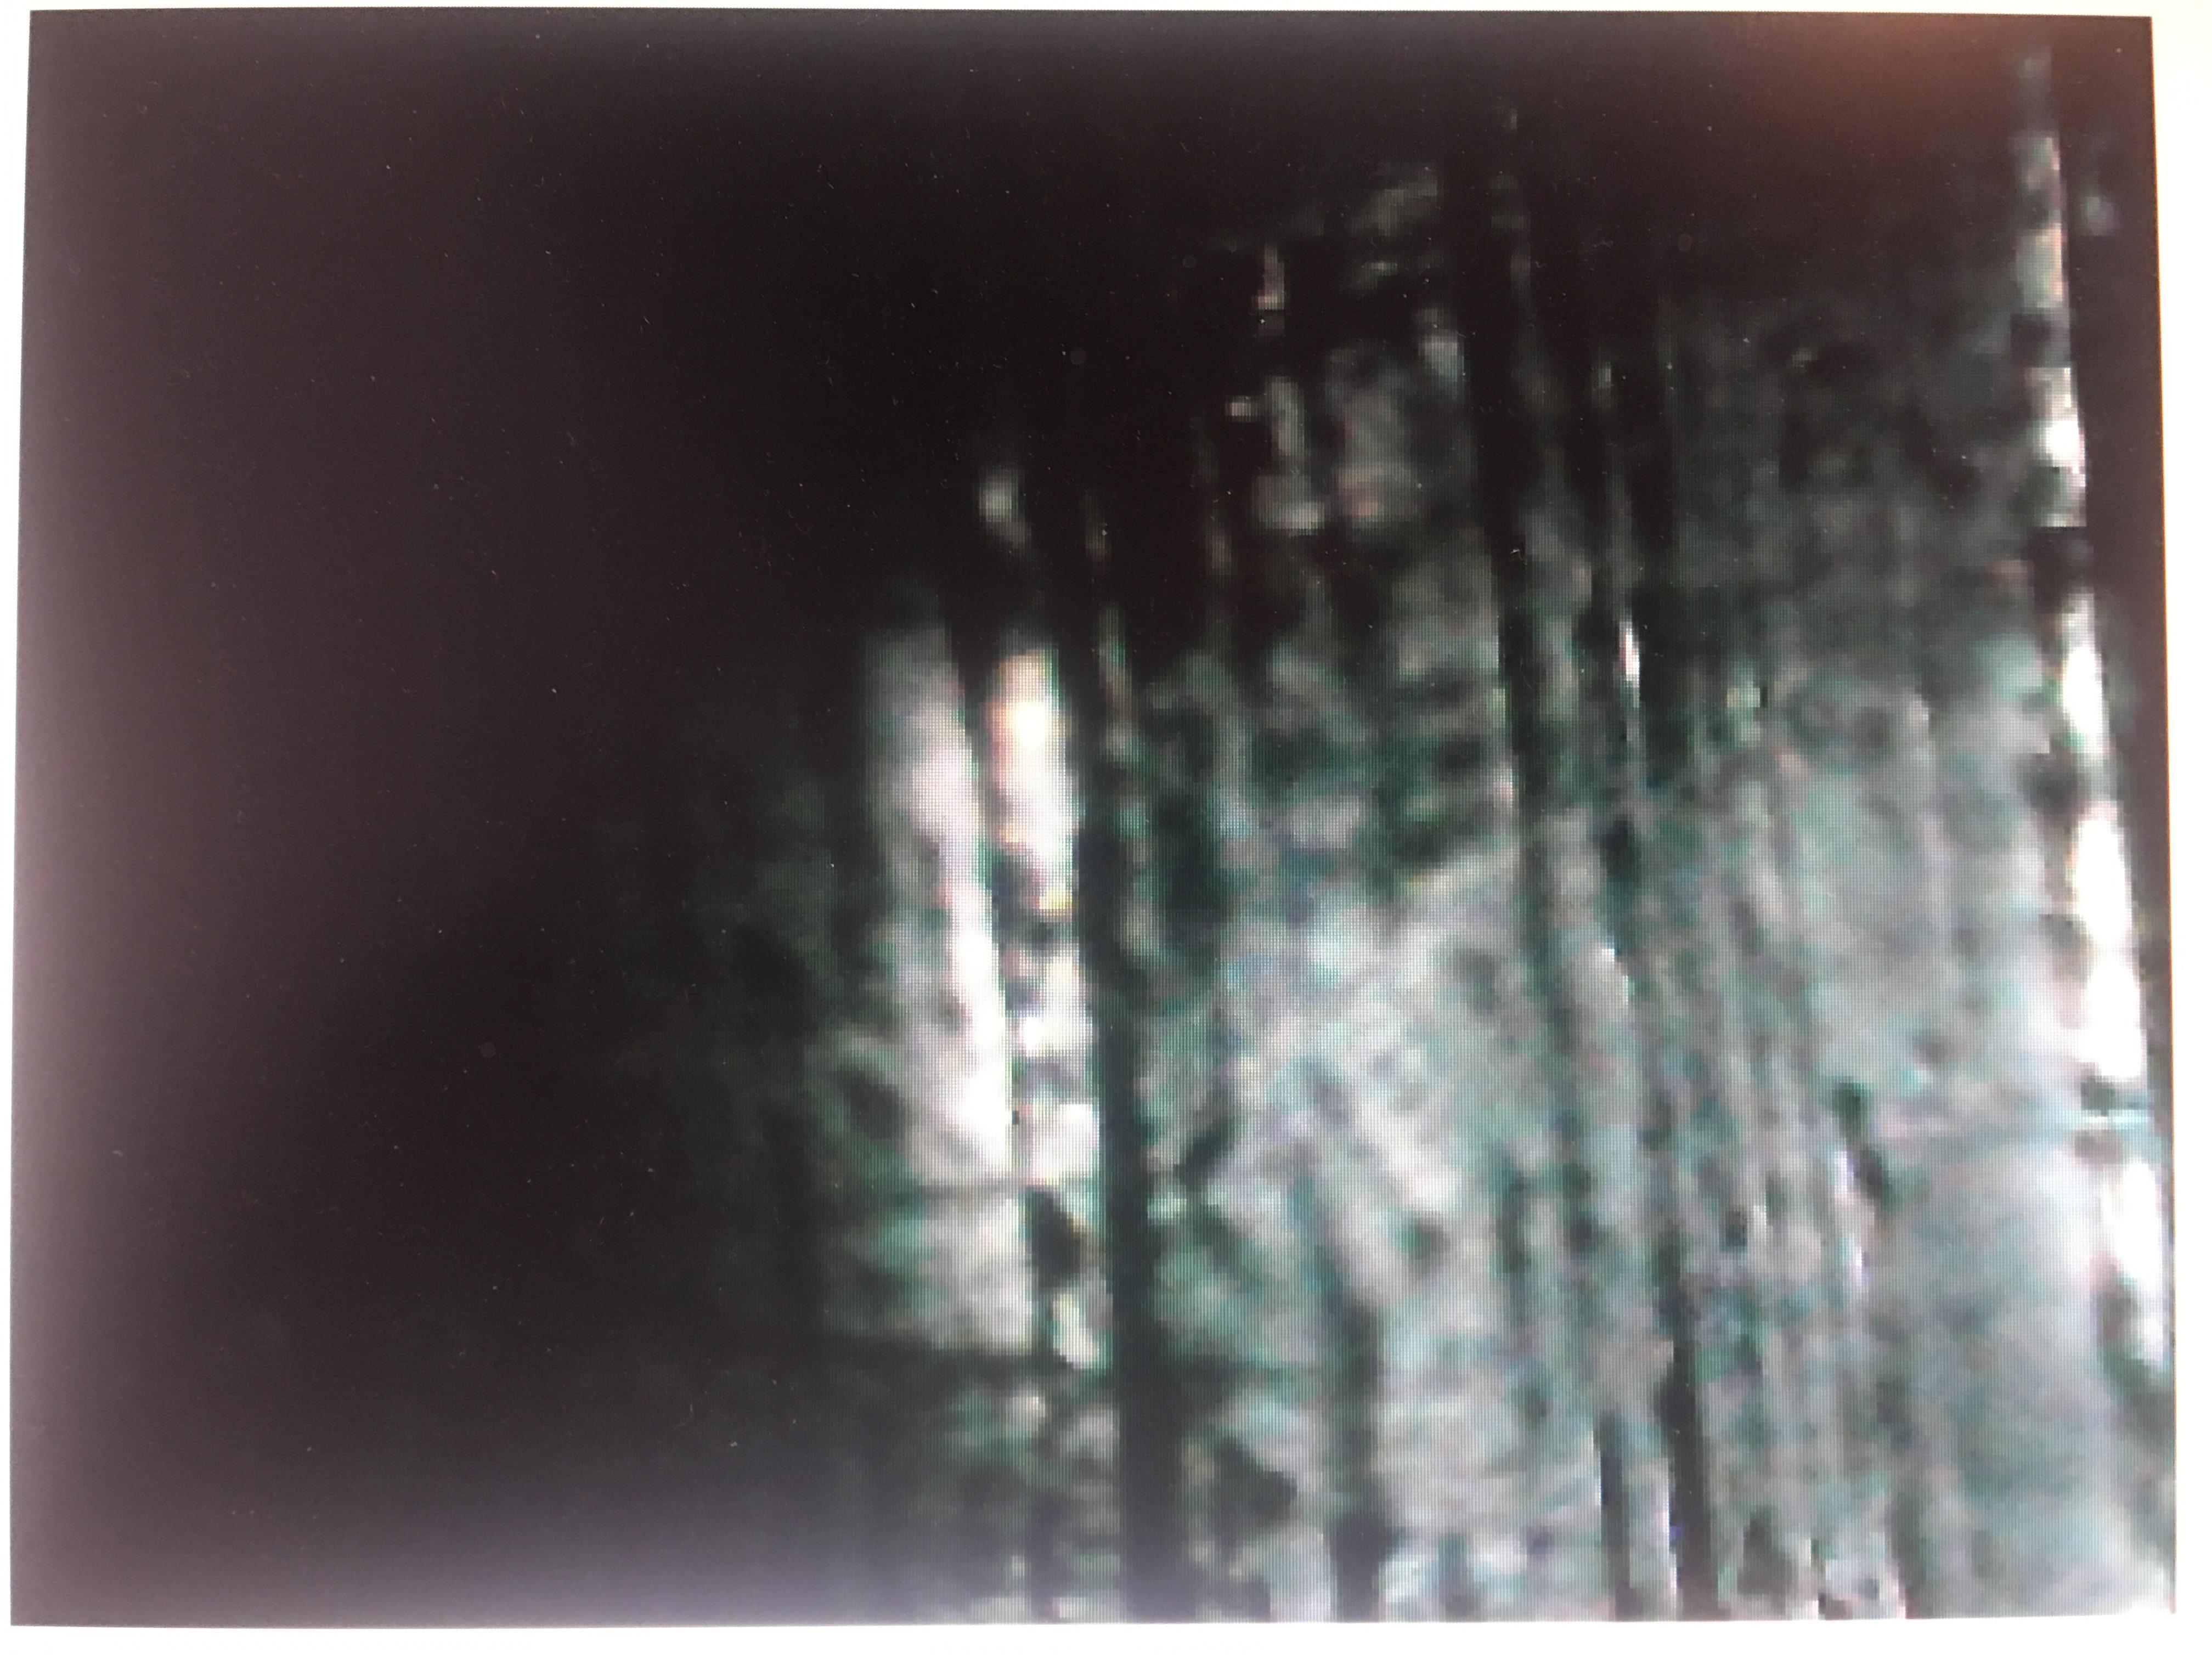 CD5990EB-3CF0-4174-A15E-34AA5A68738E.jpeg